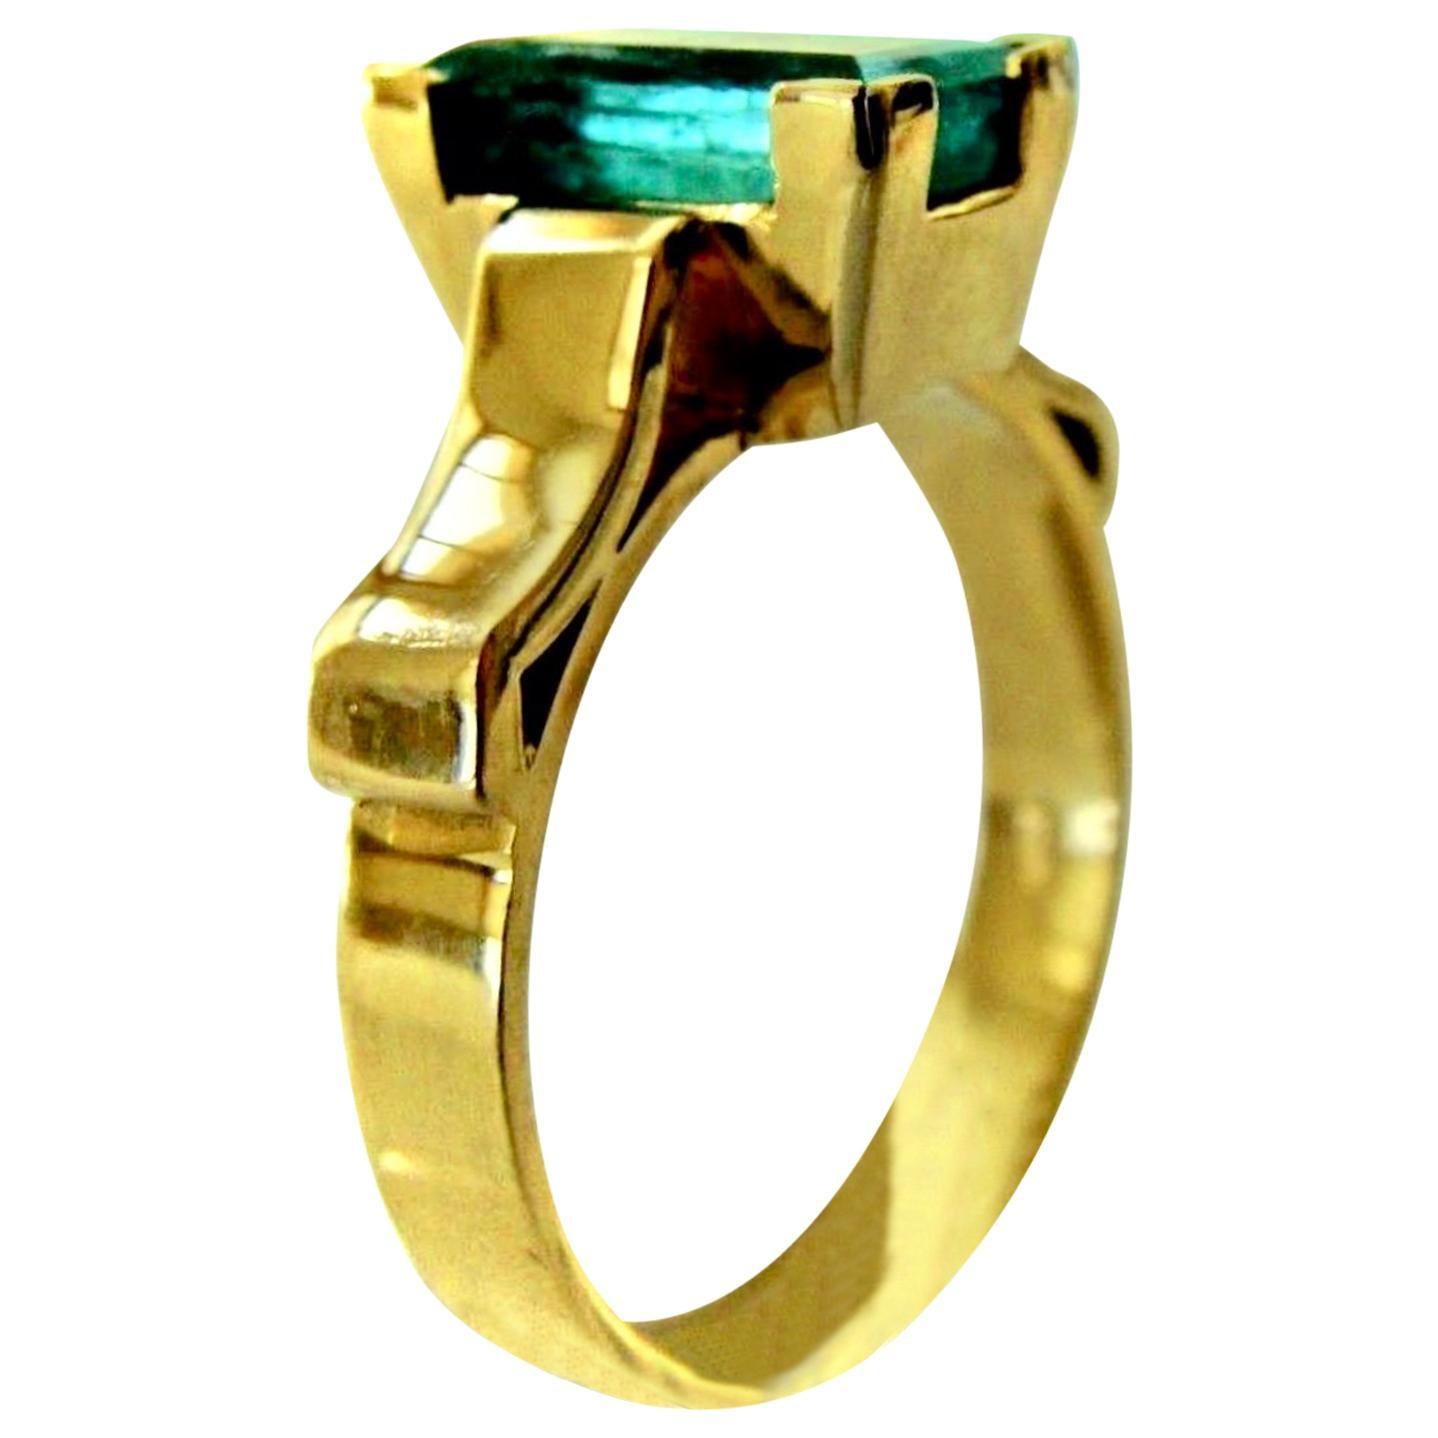 2.0 Carat Emerald Solitaire Ring 18 Karat Yellow Gold